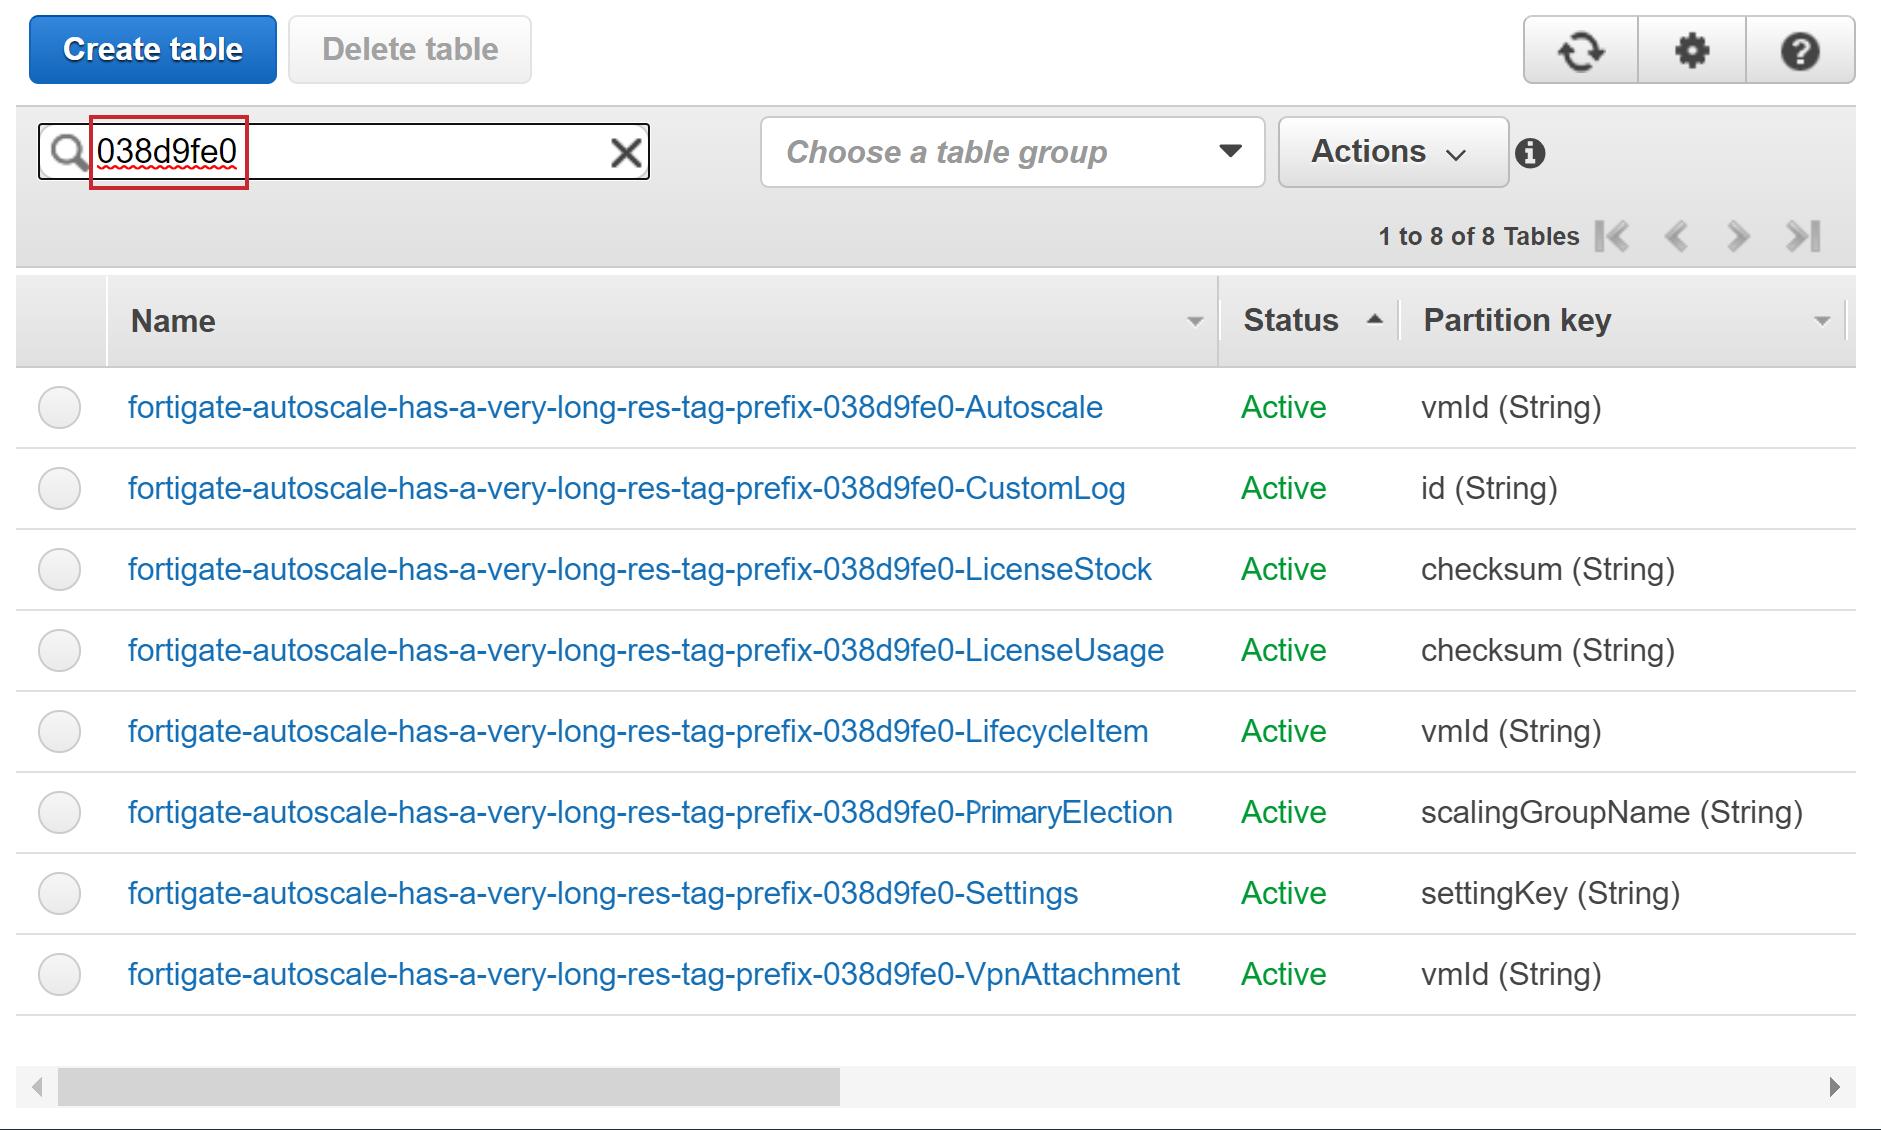 Filtered DynamoDB tables